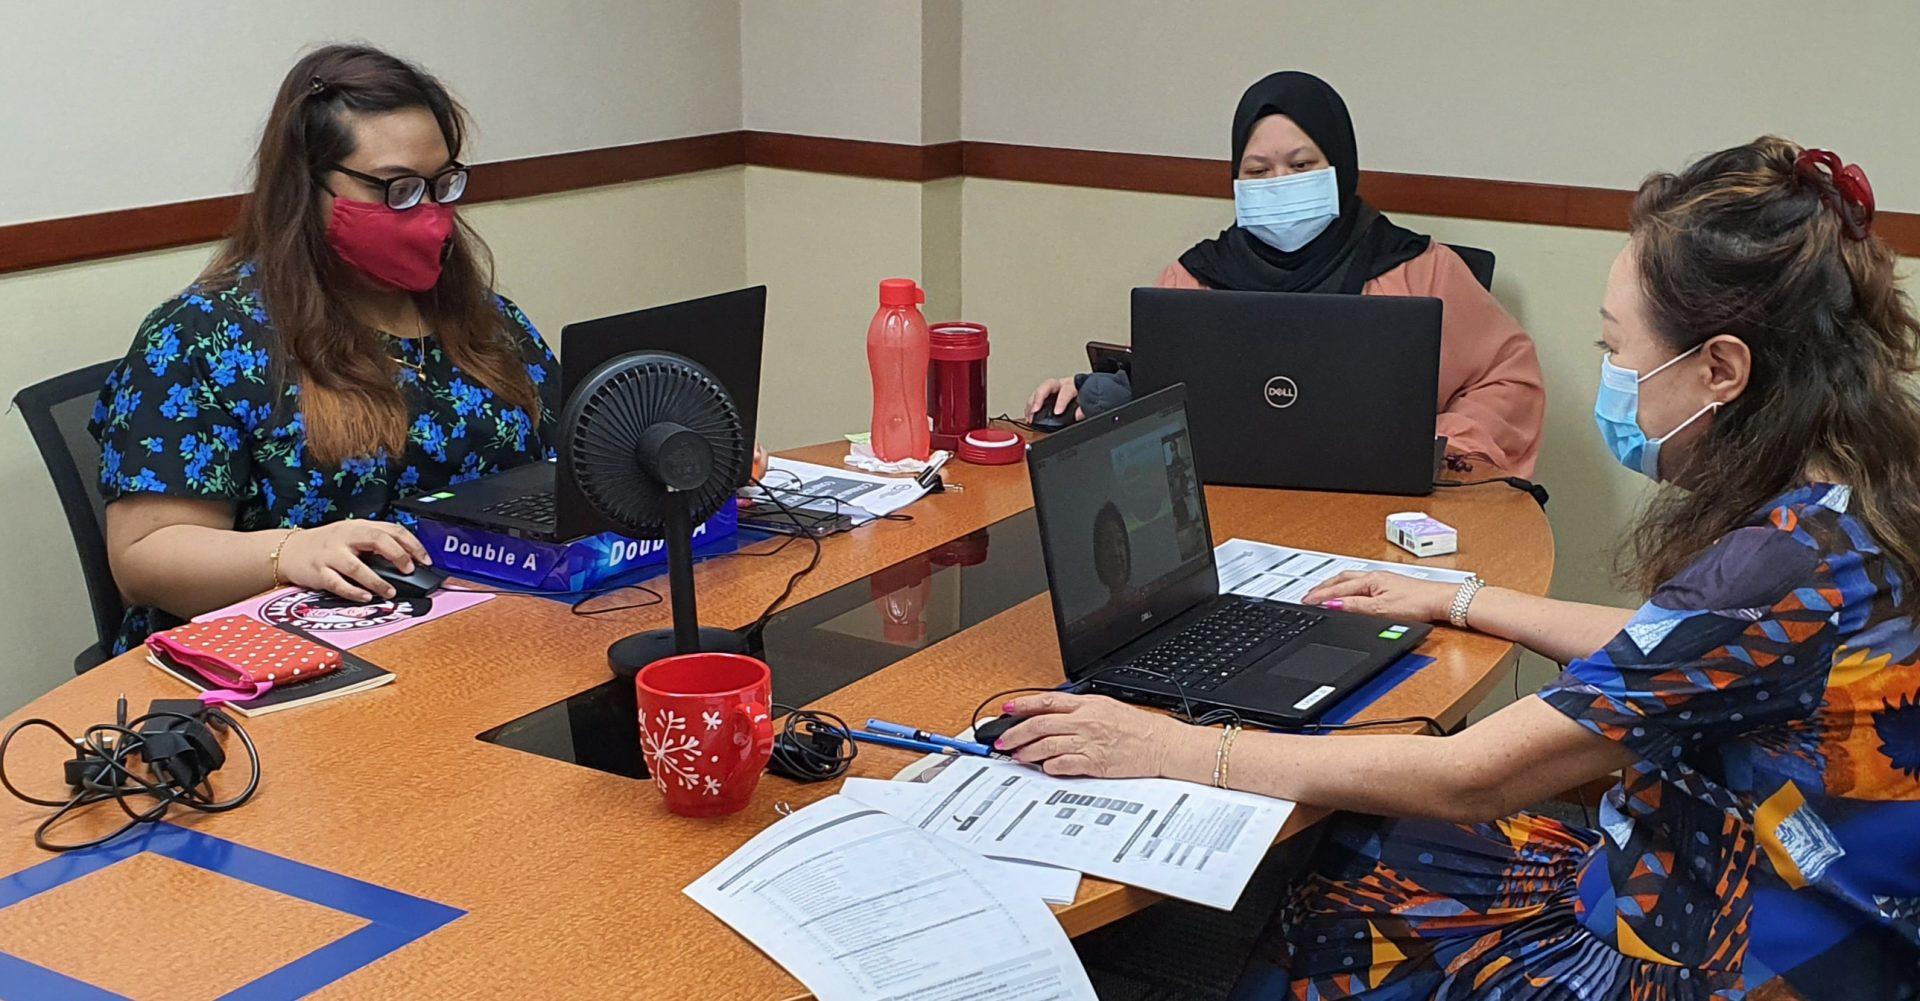 SOS Samudra: Seacare Manpower conducting online training